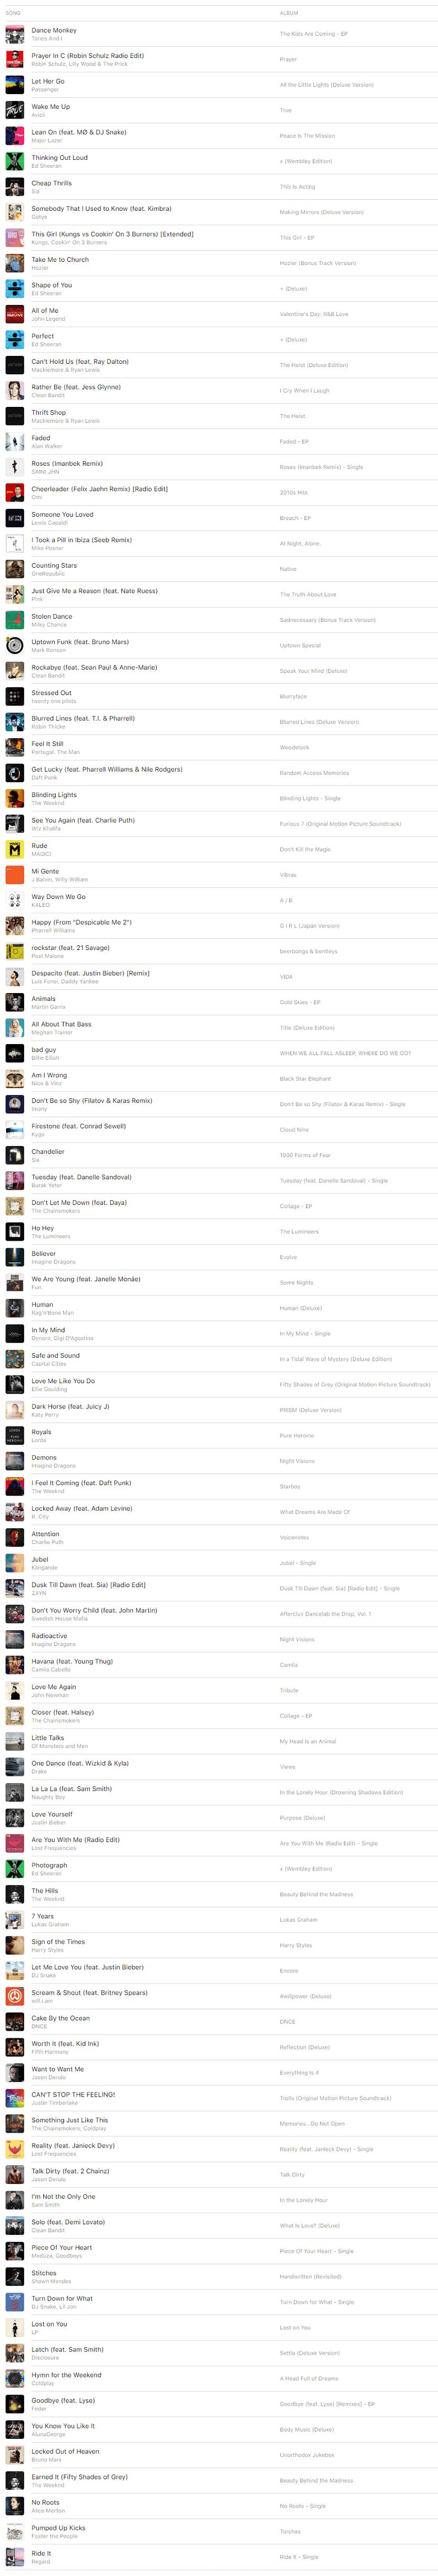 top 100 shazam